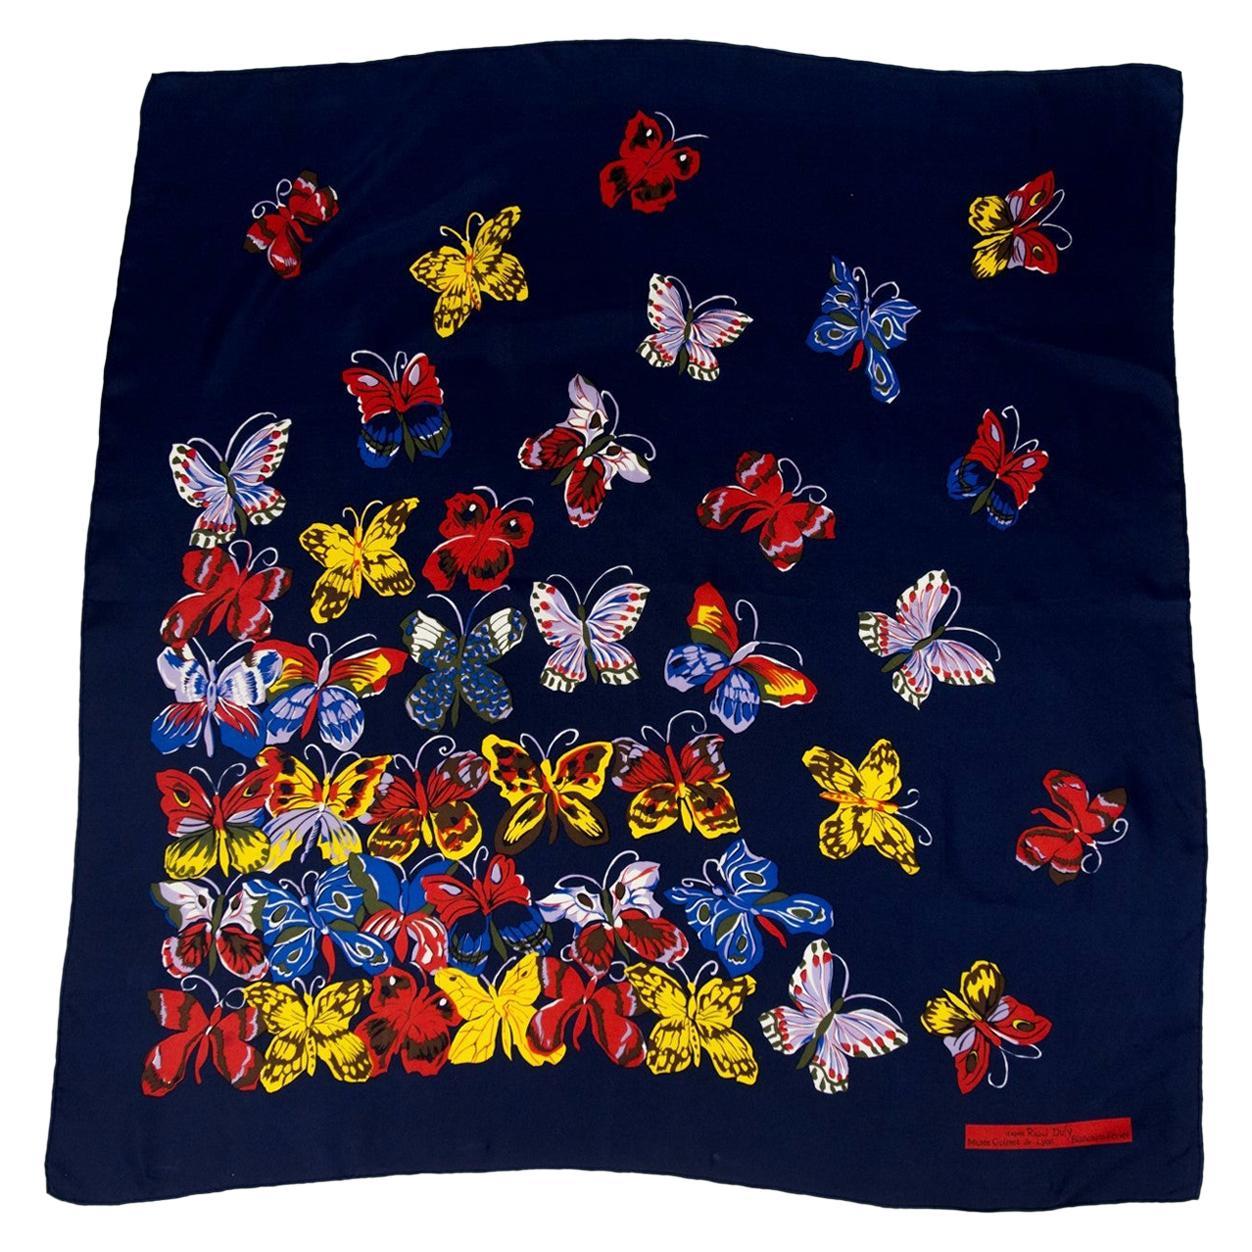 A Raoul Dufy silk square, Bianchini-Férier Circa 1990/2000